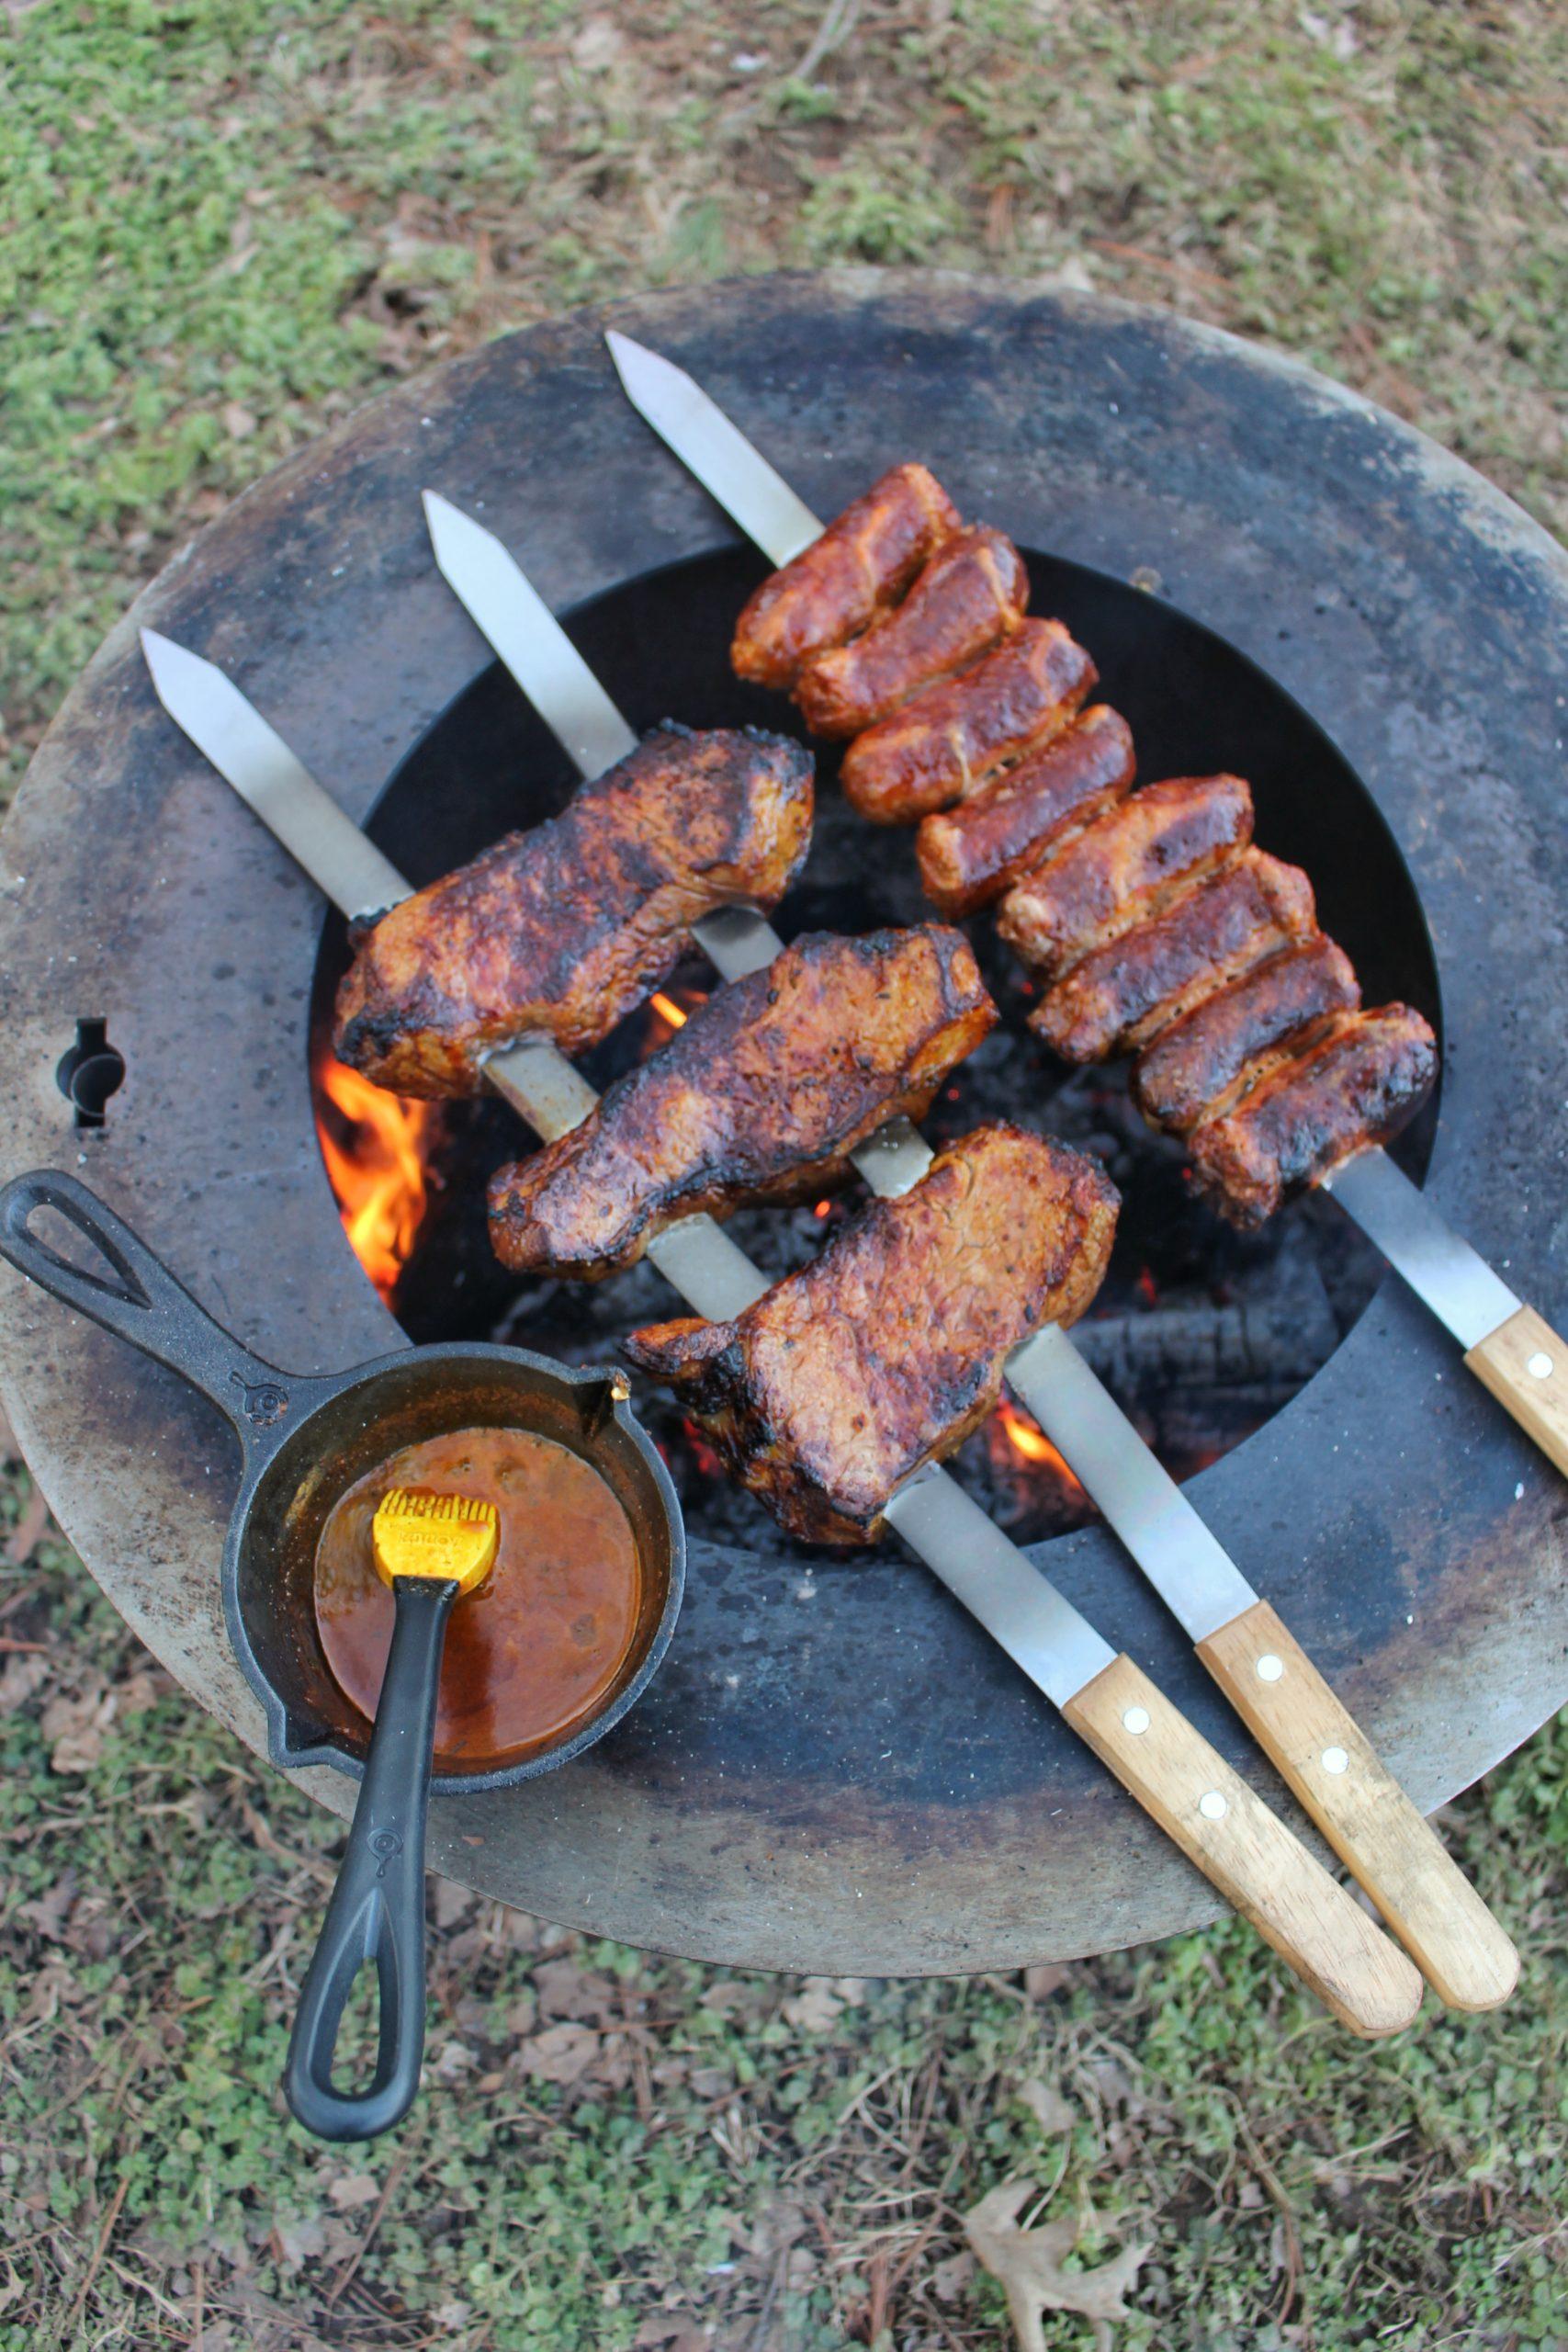 steak and chorizo on a good fire pit like Breeo